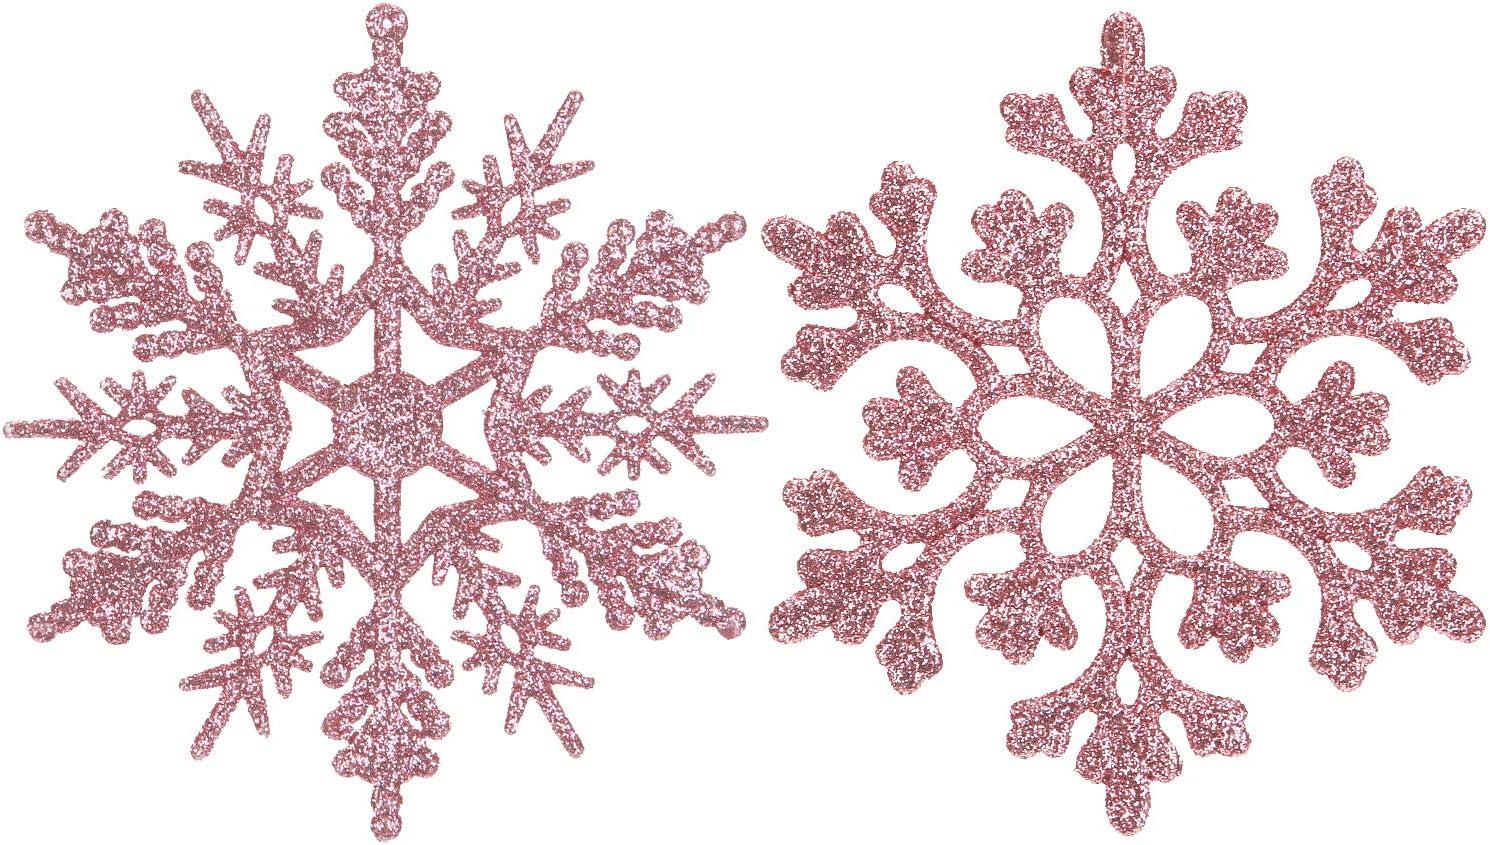 Sea Team Plastic Christmas Glitter Snowflake Ornaments Christmas Tree Decorations, 4-inch, Set of 36, Pink